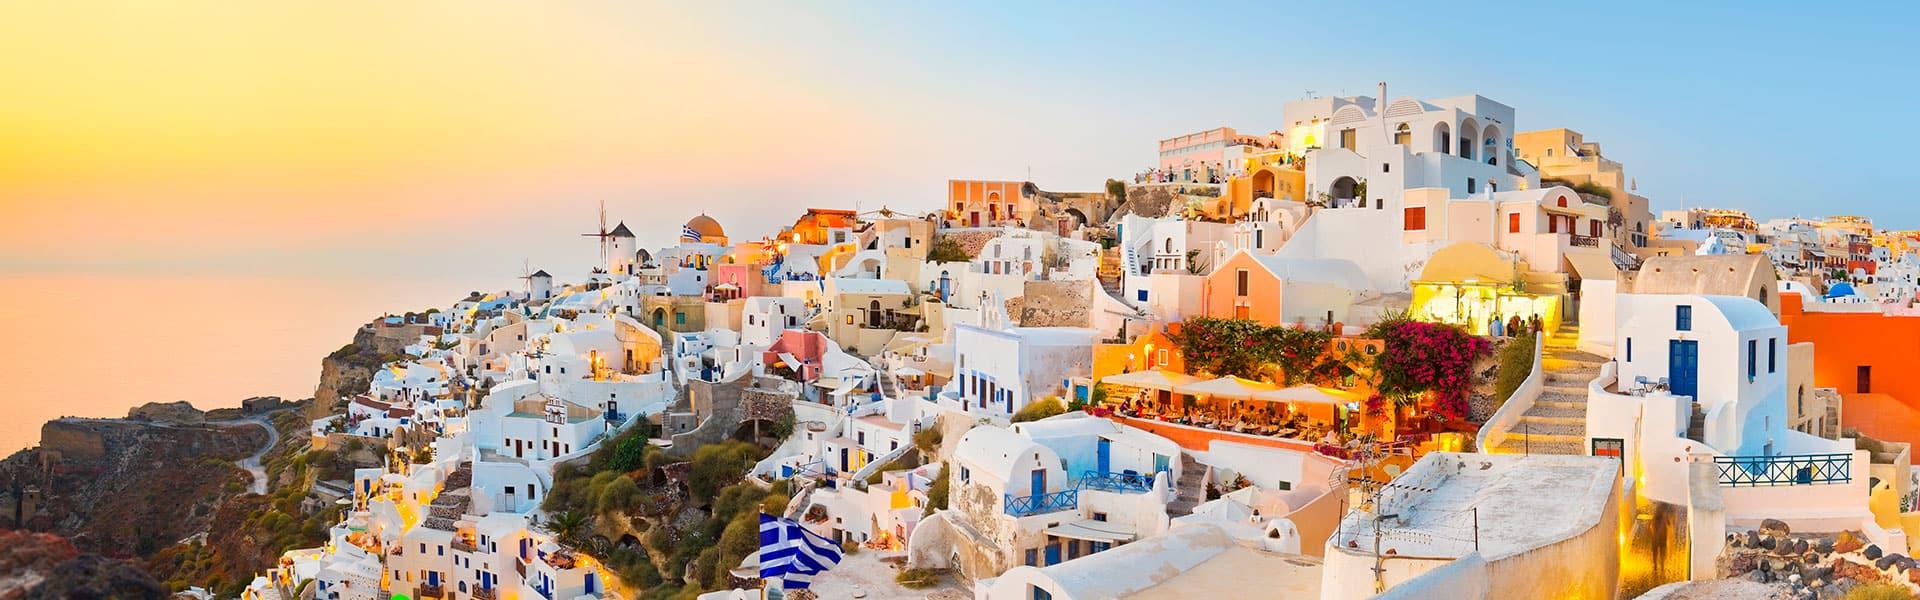 Greek Isles: Santorini, Athens & Florence